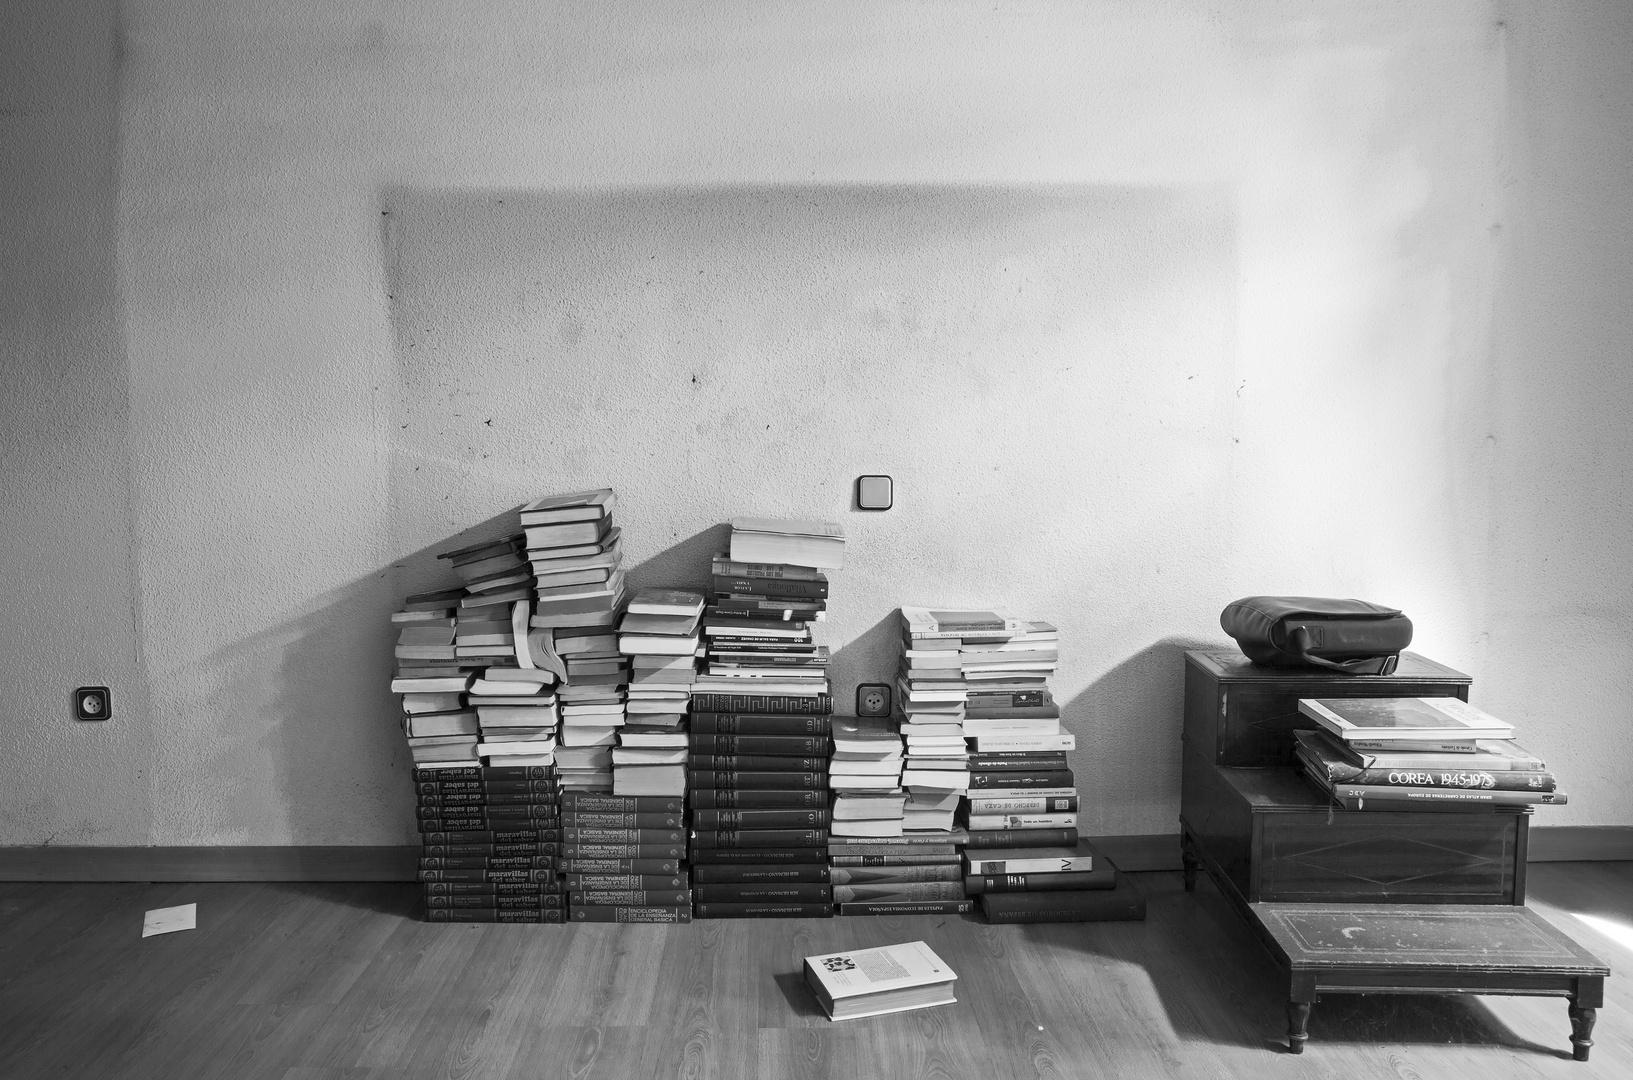 La huella de la lectura